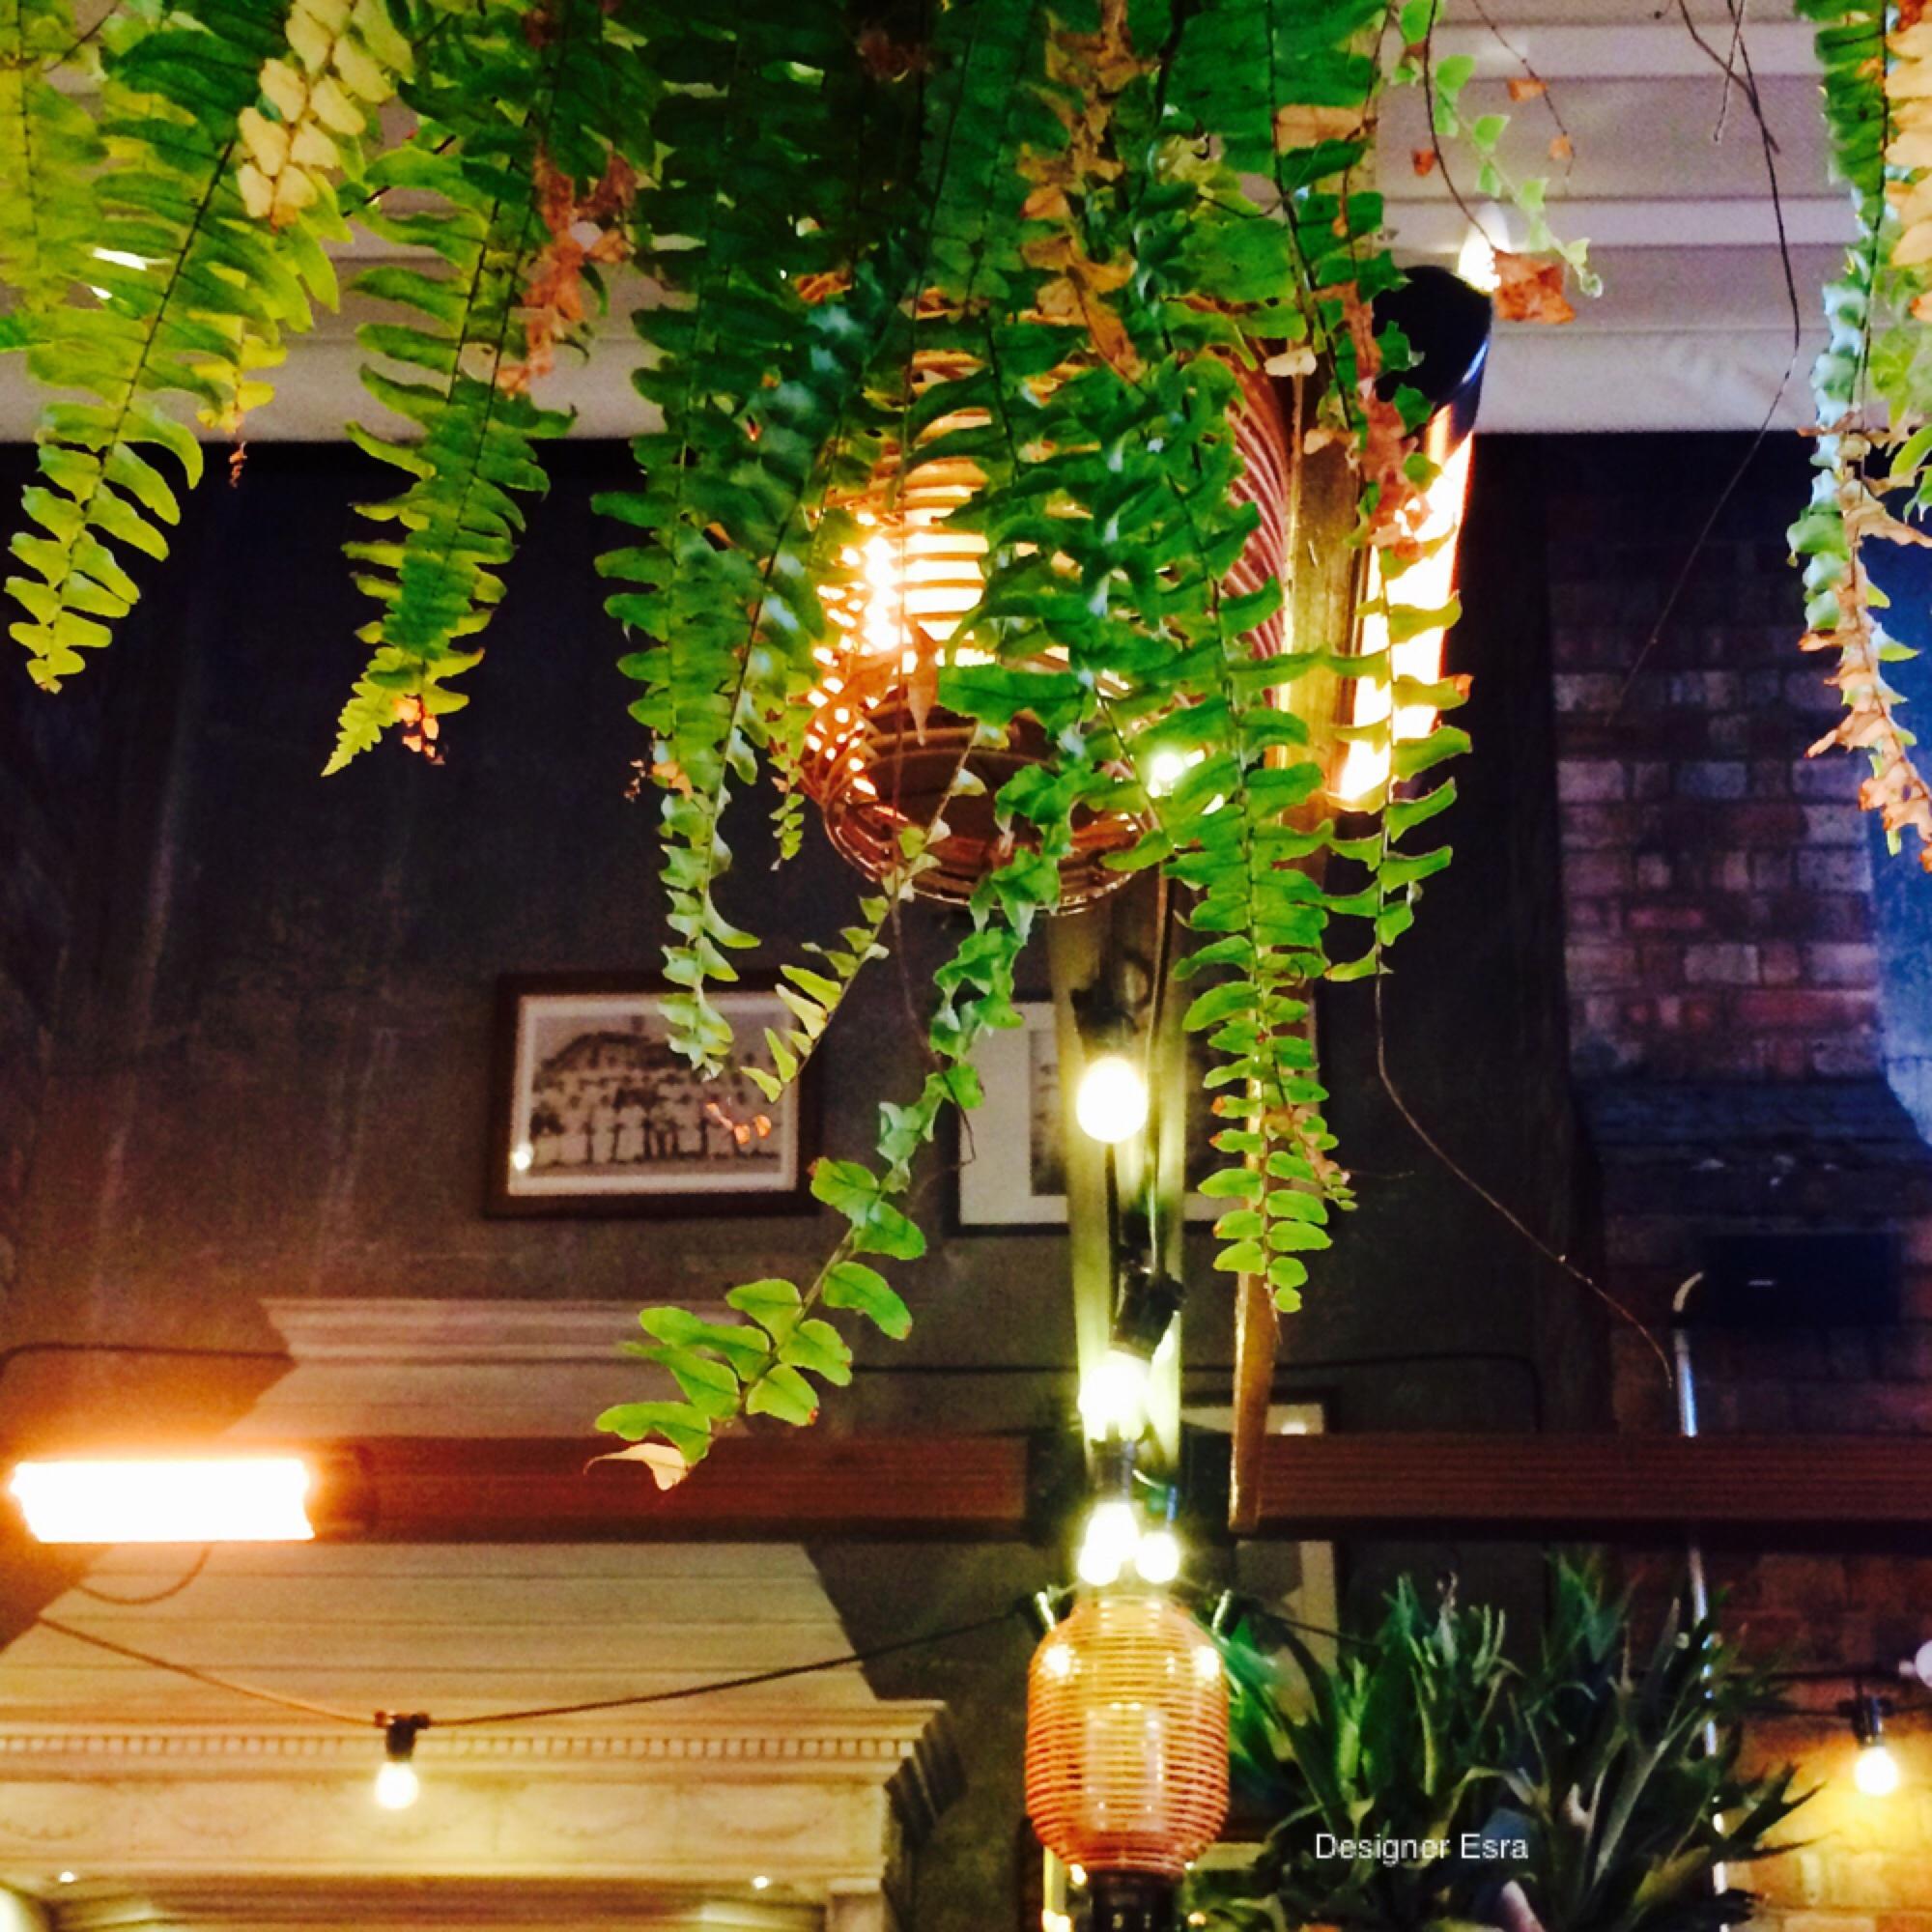 Lights and plants